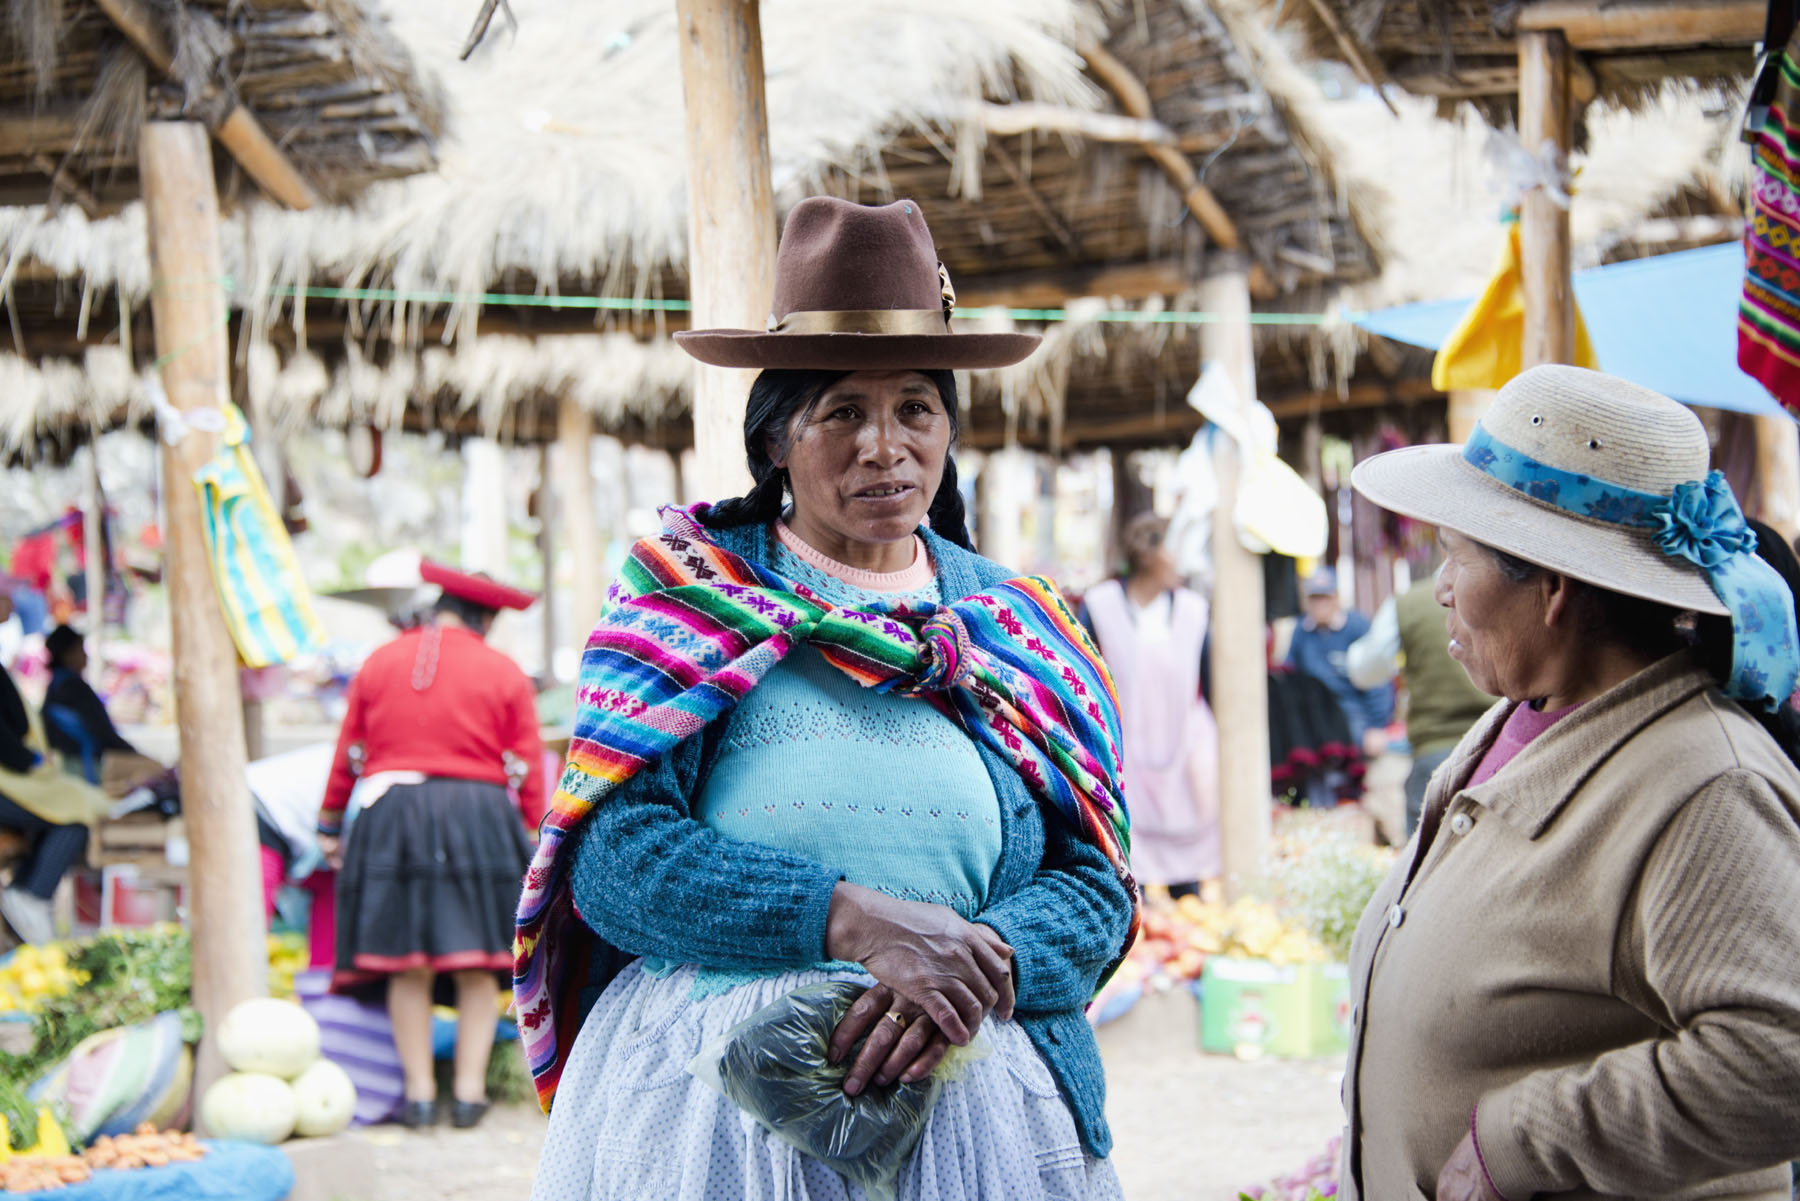 075-Peru-5-15.jpg